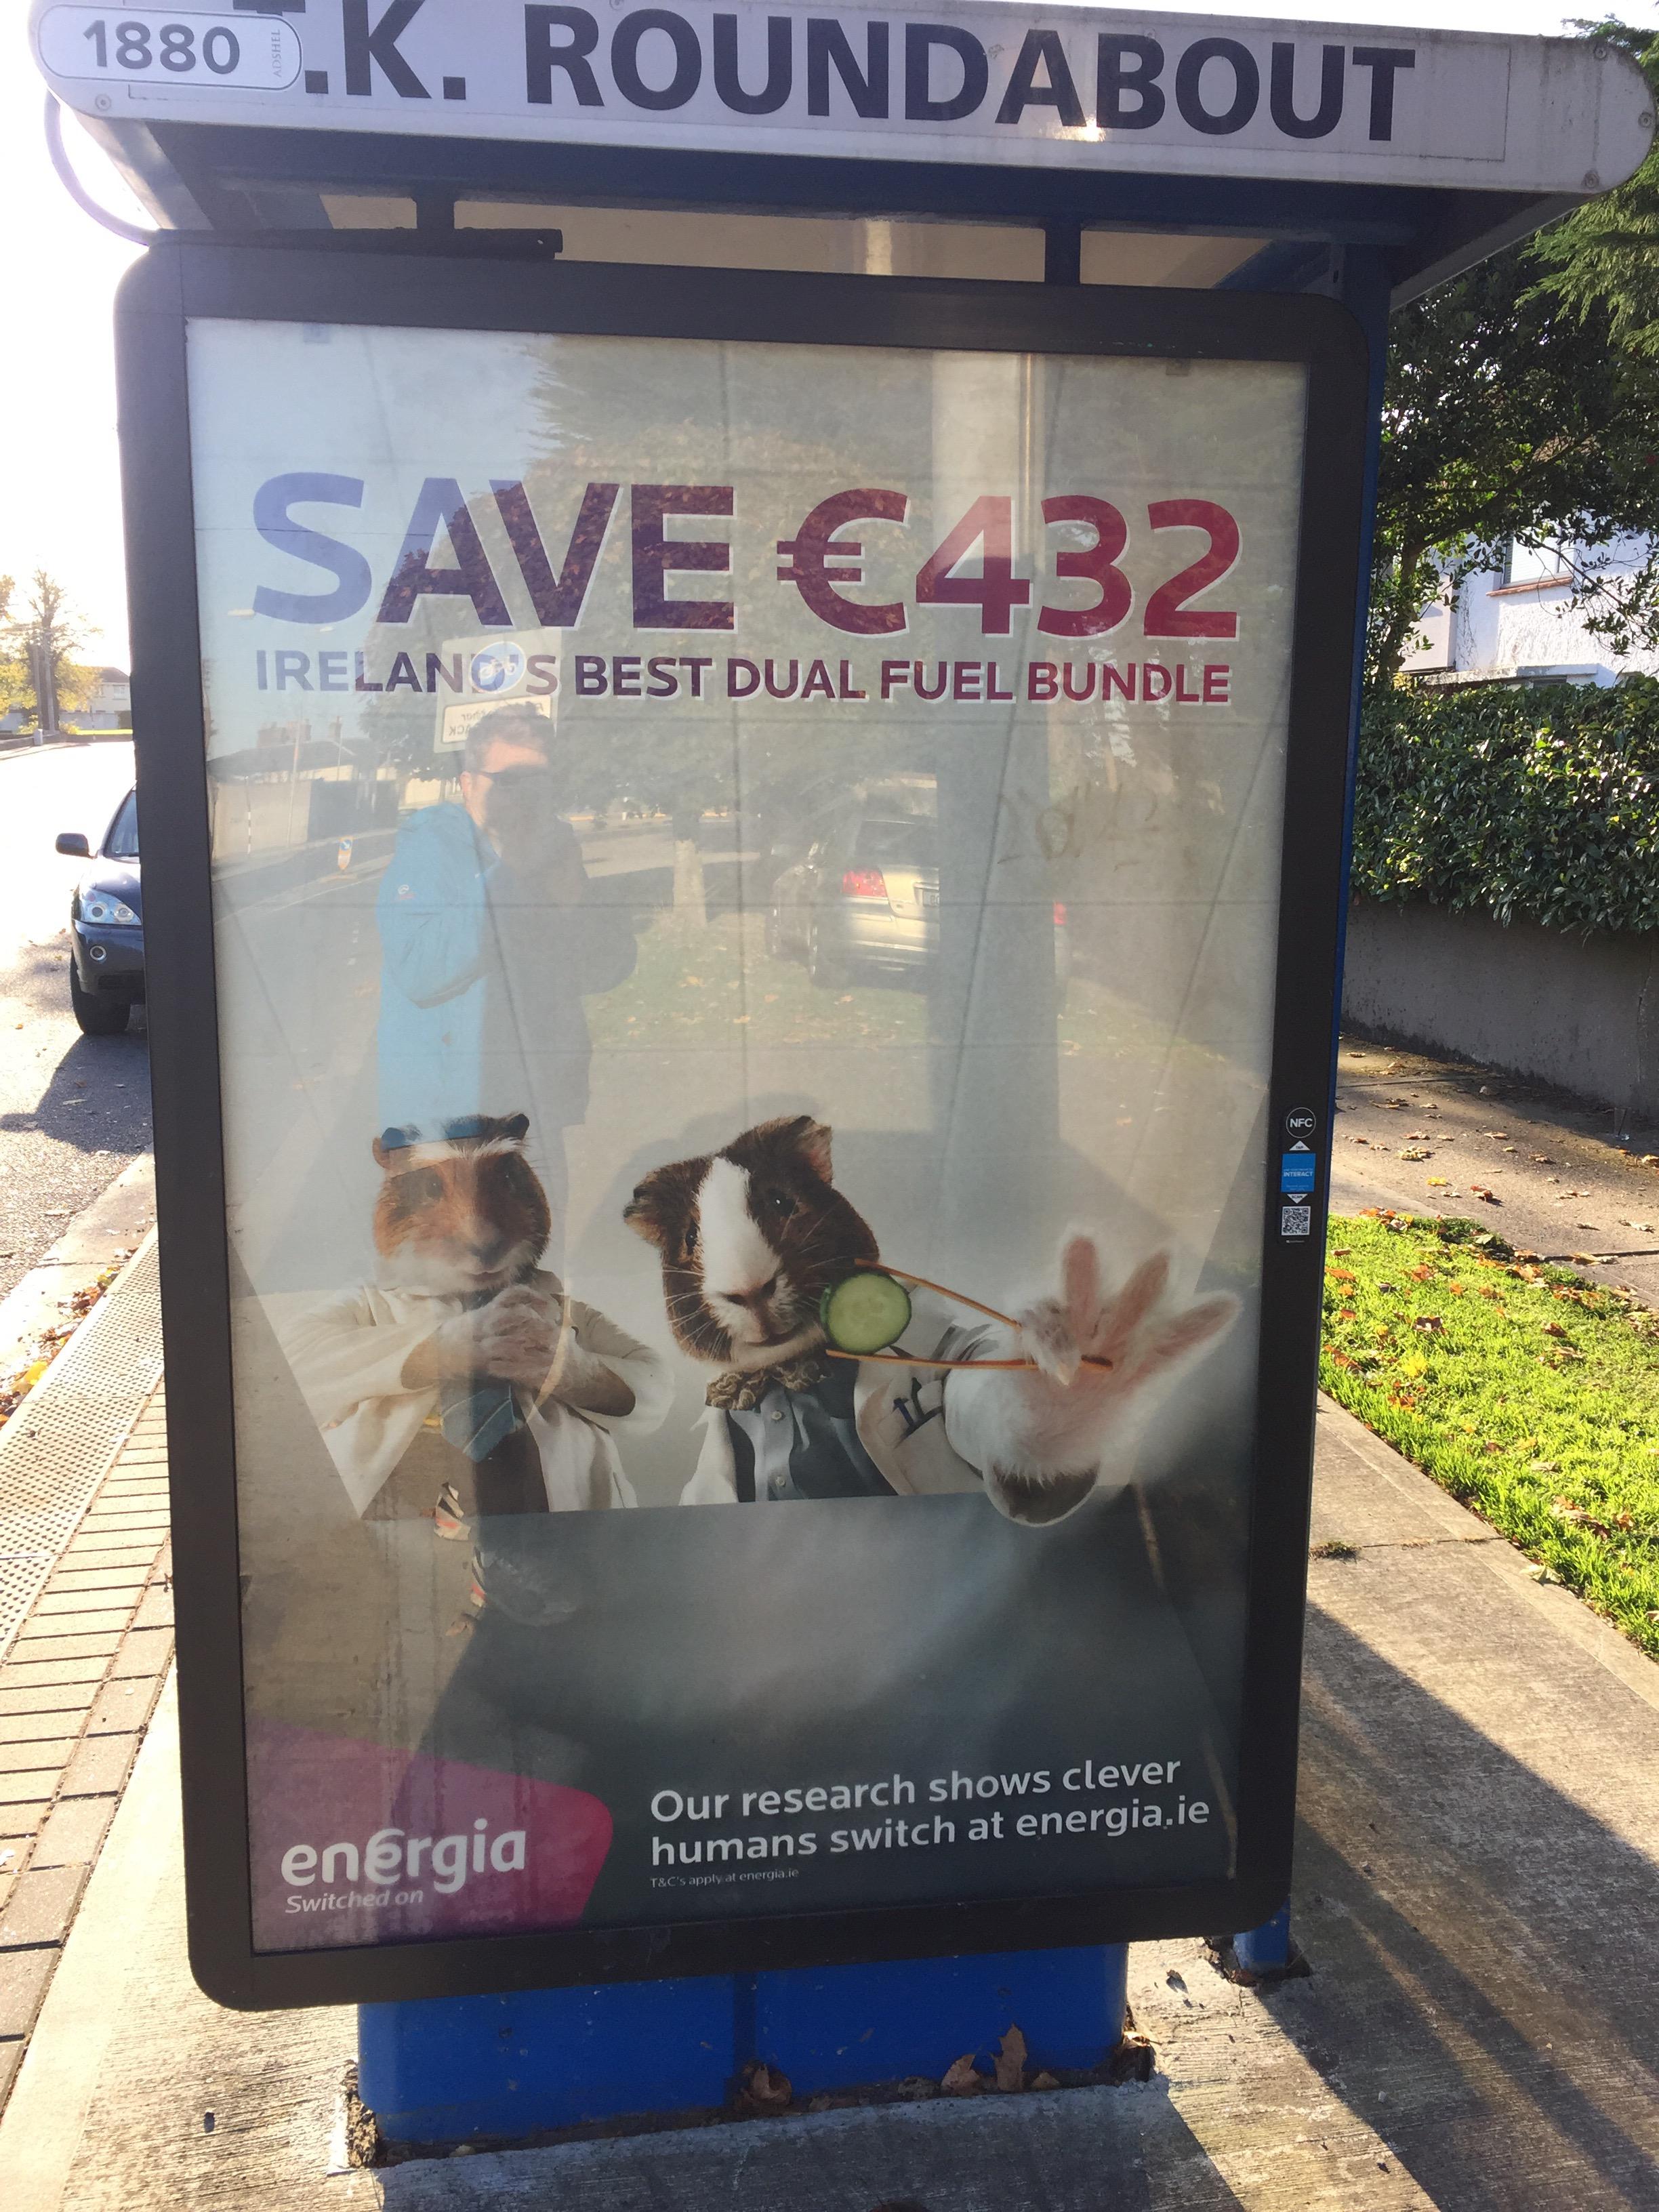 Energia – save €432 Ireland's best dual fuel bundle